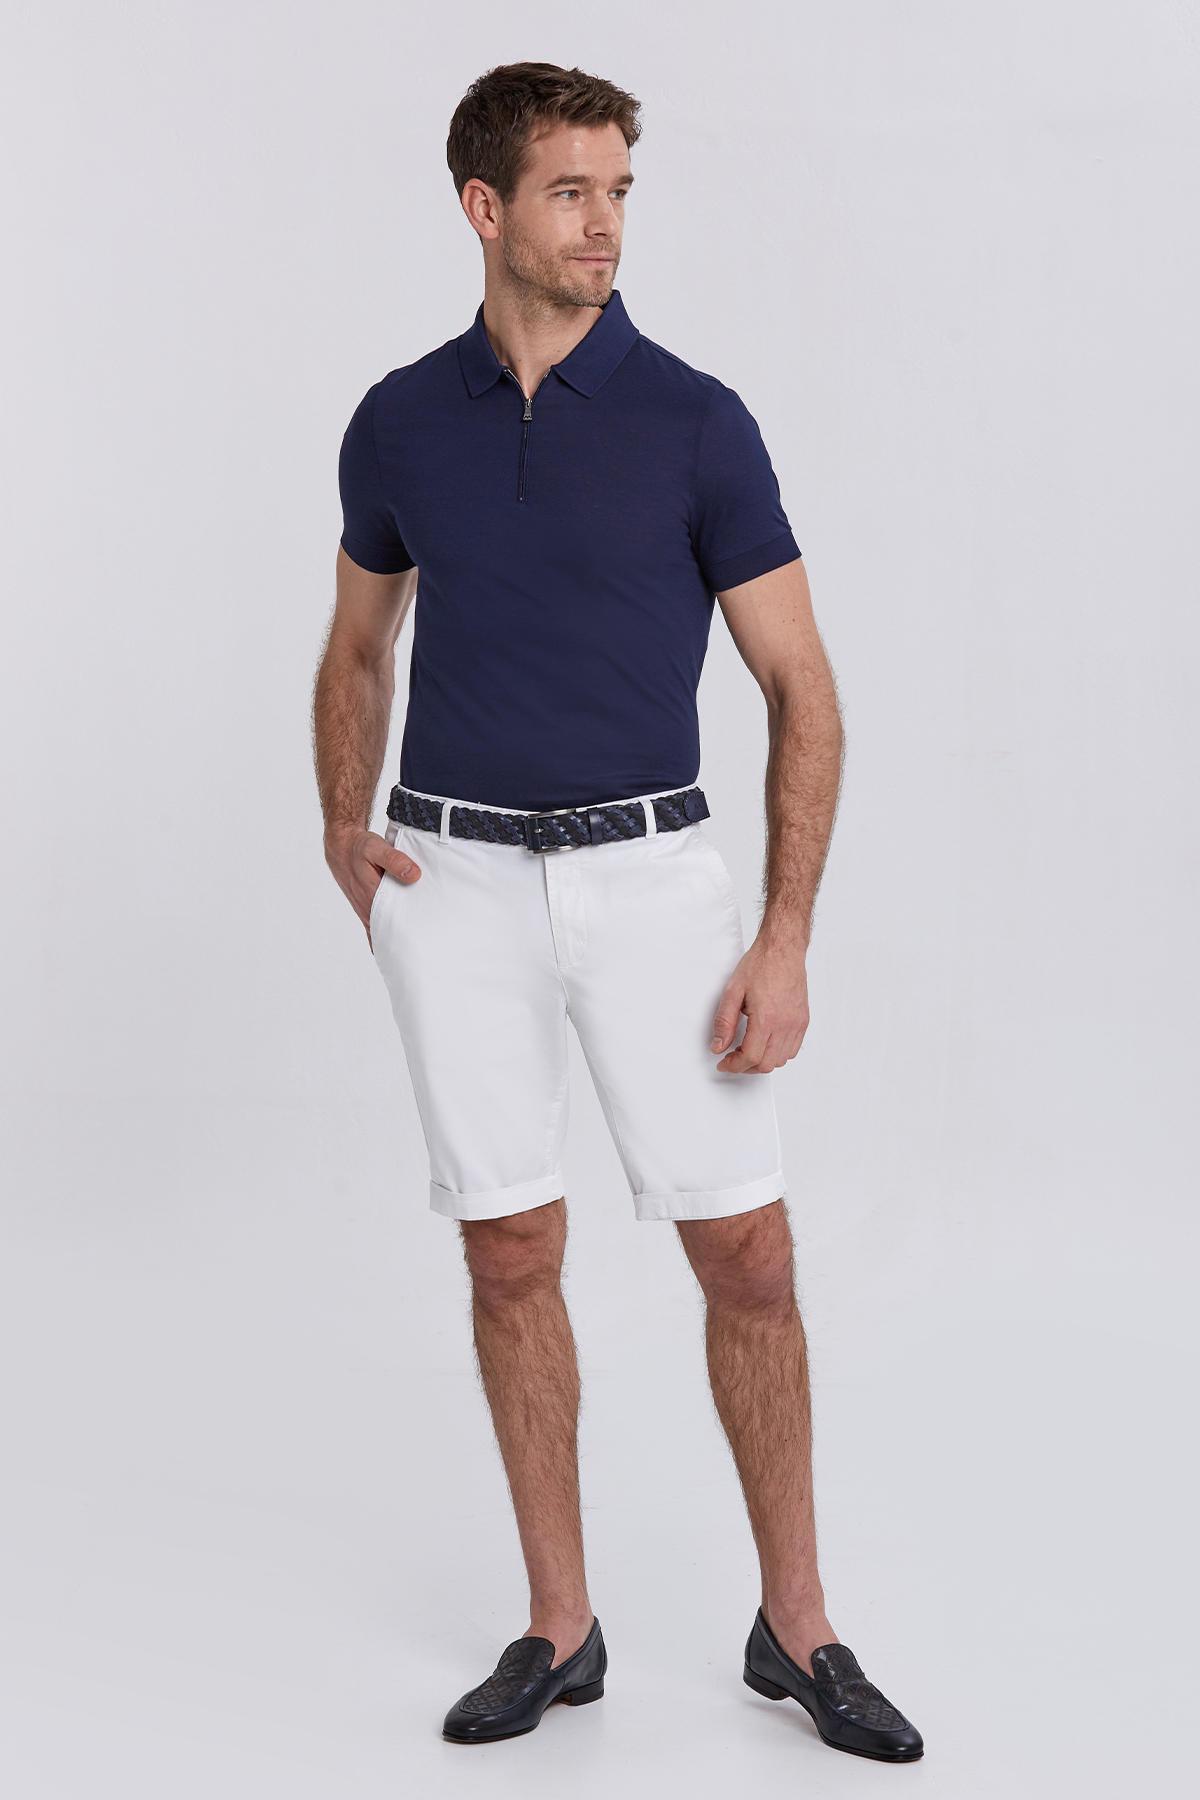 Lacivert Pamuk Fermuarlı Polo Yaka T-shirt